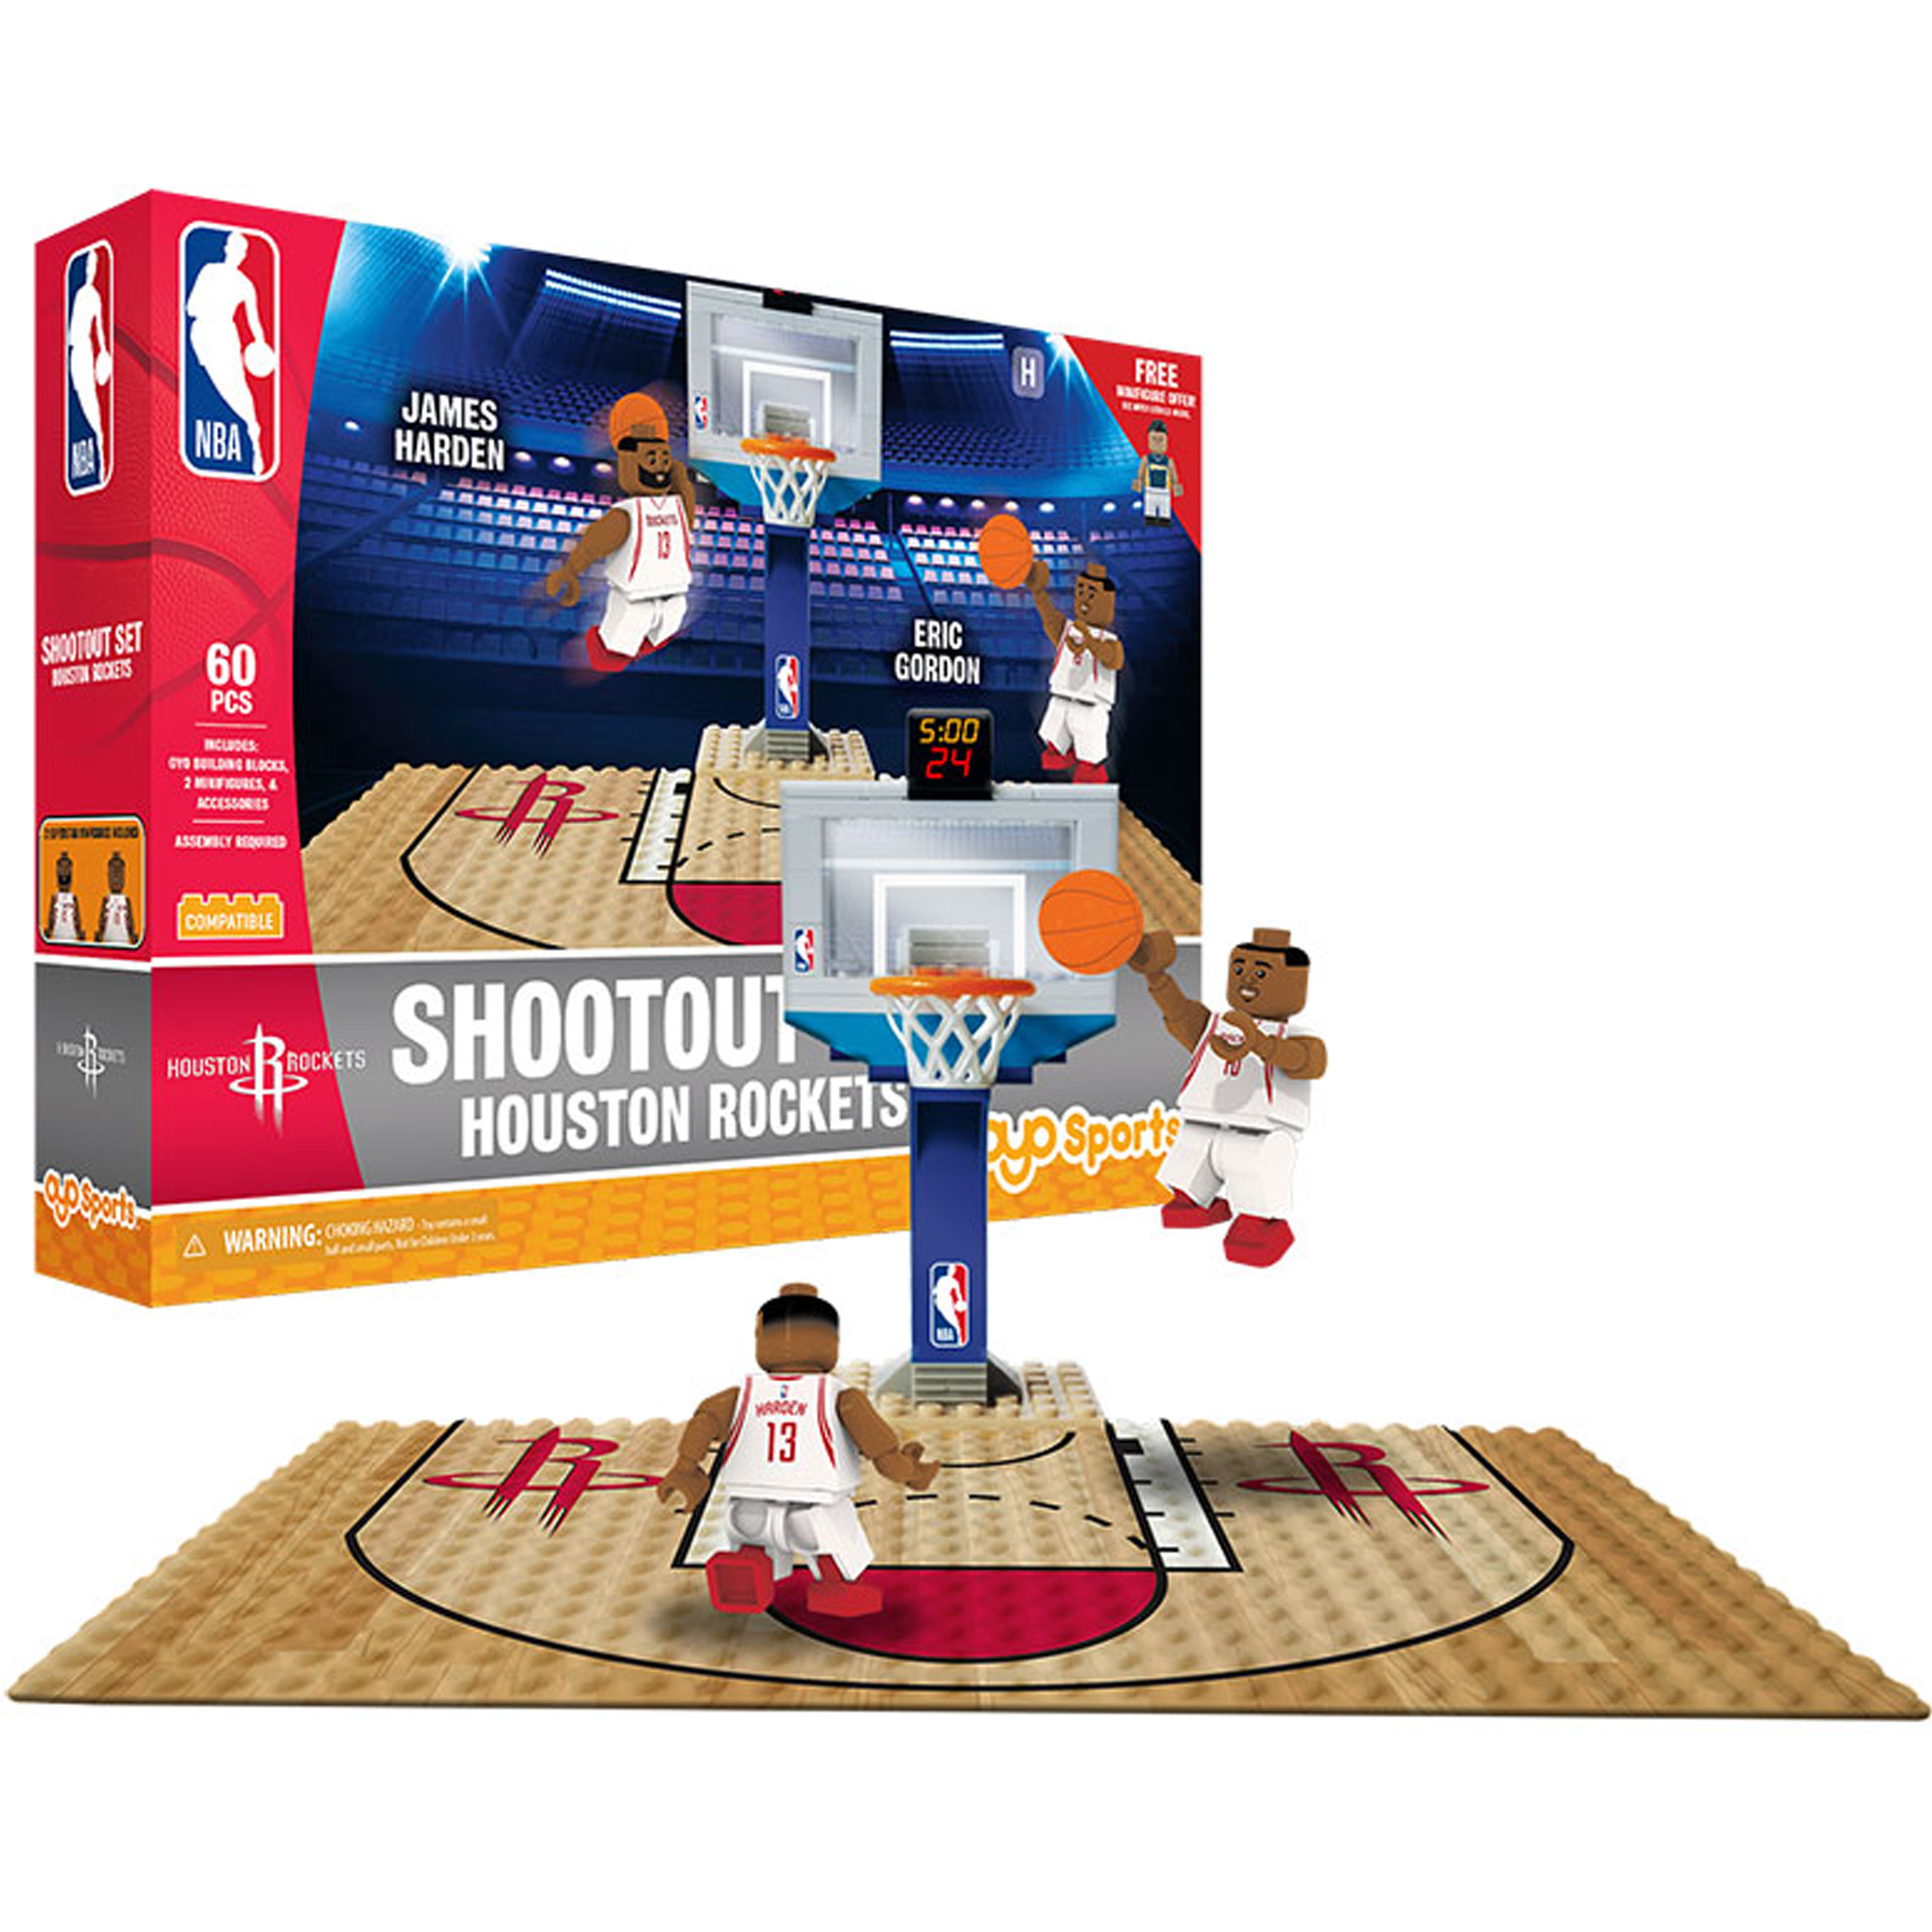 Houston Rockets 3 Point Shot Buildable Set - No Size